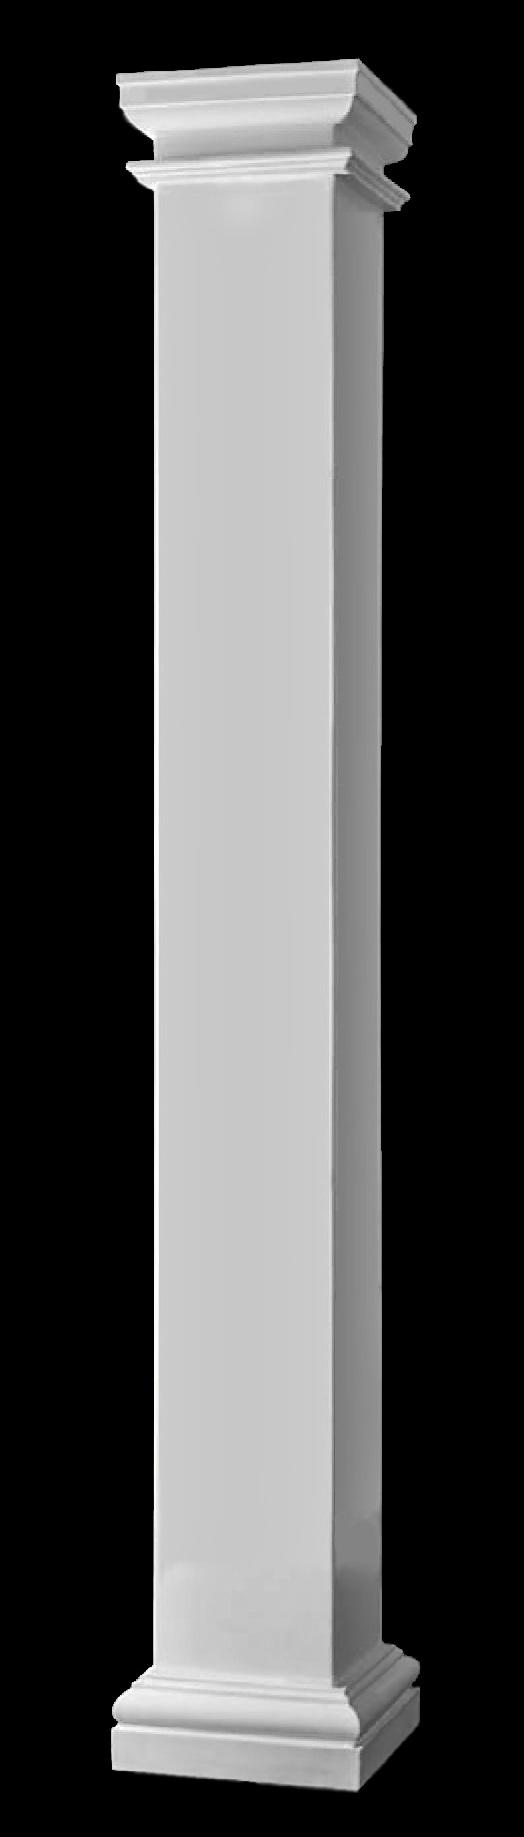 Crown Columns Fiberglass : Plain square interior columns detail nontapered